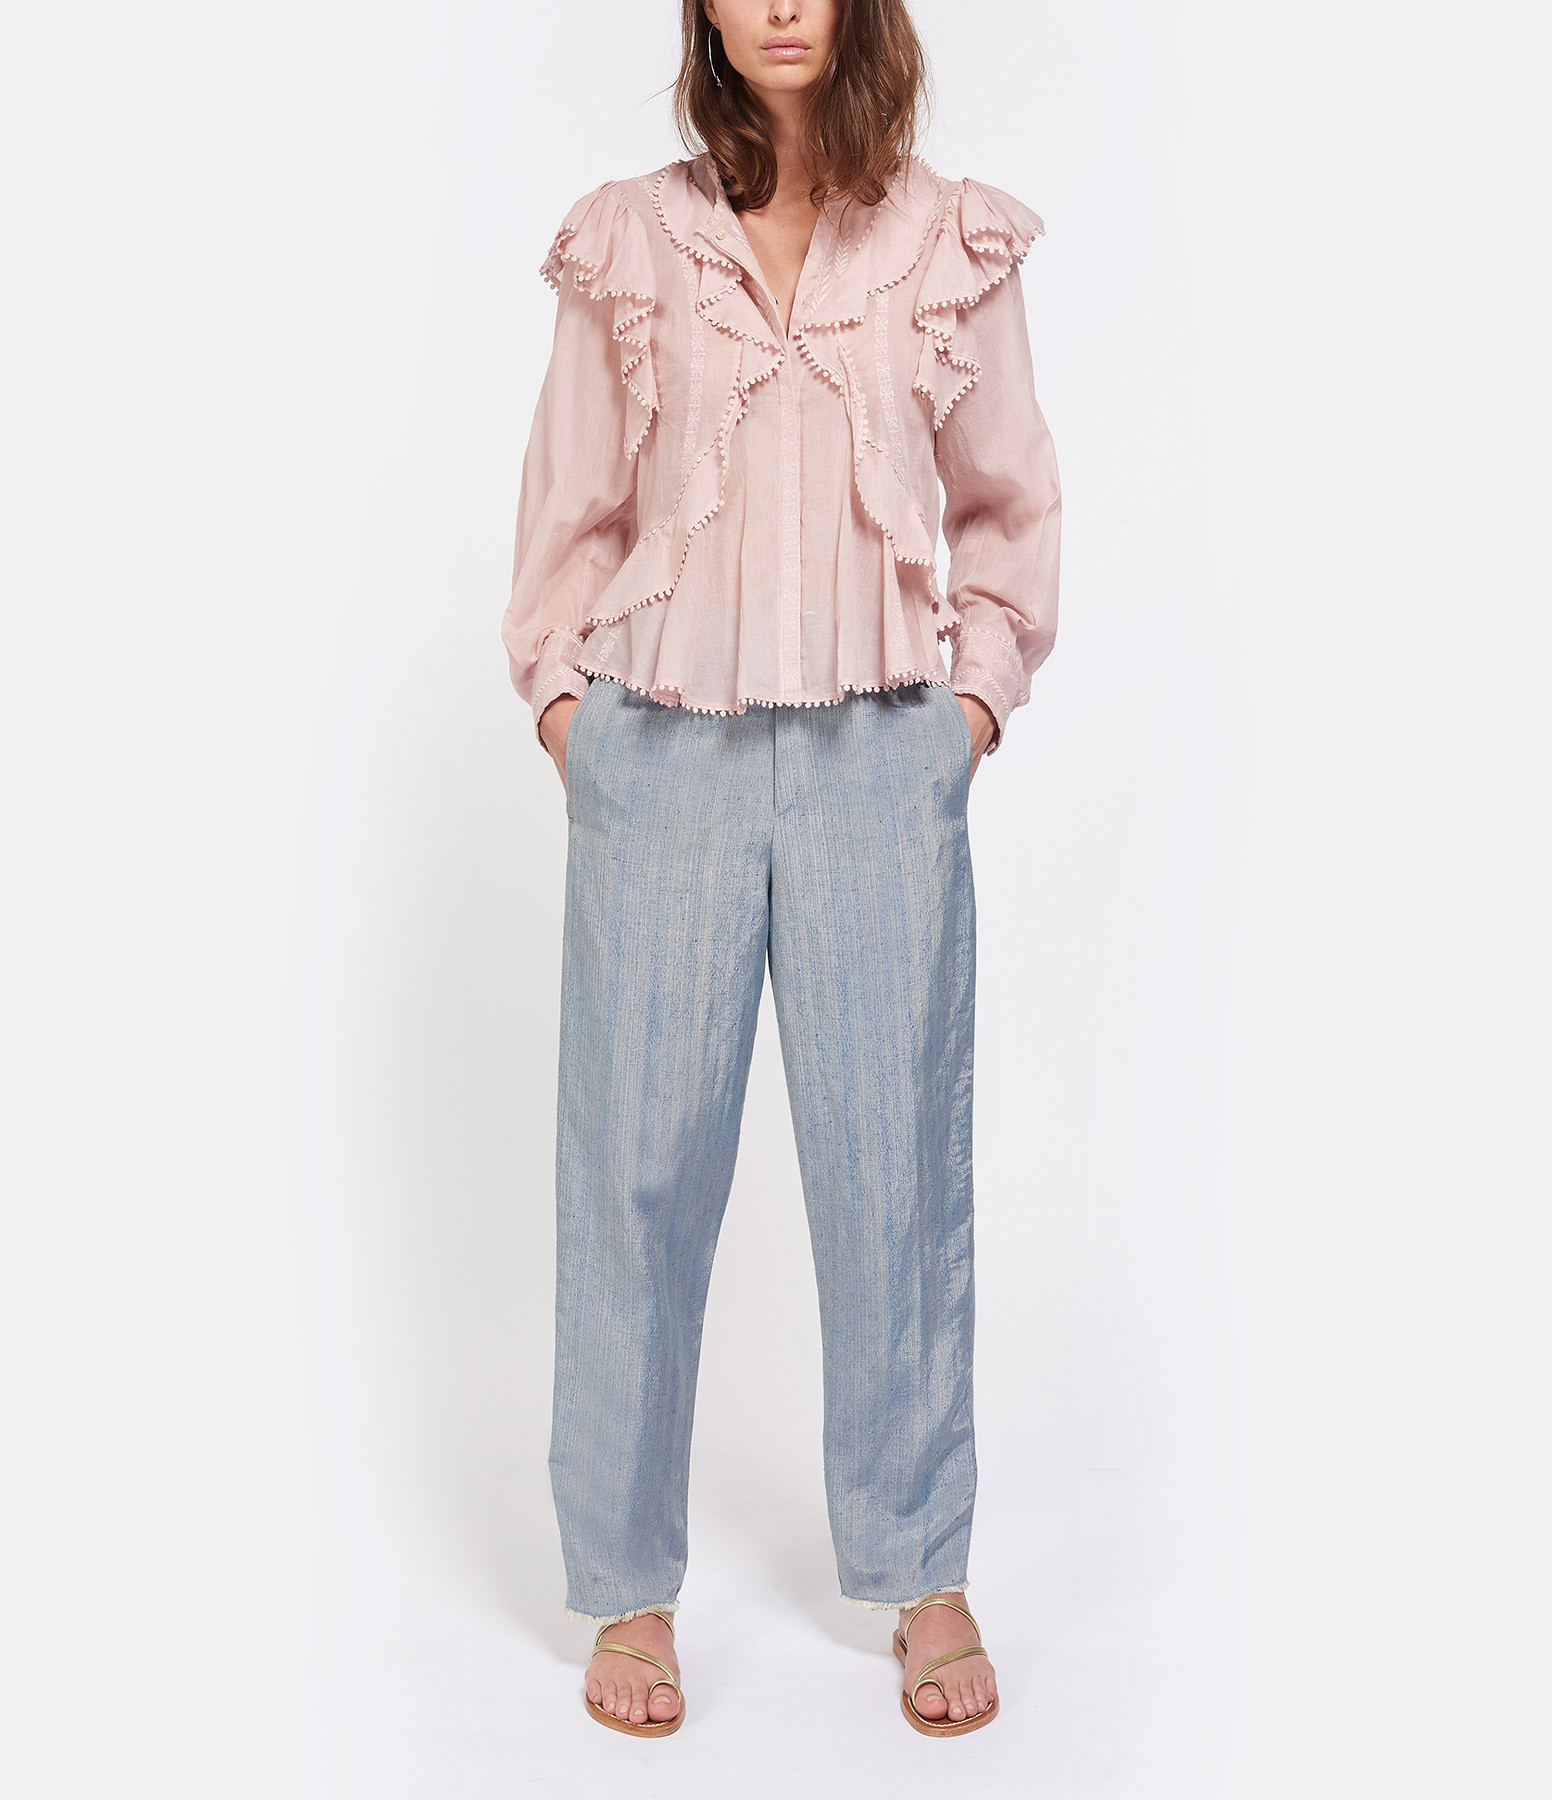 FORTE_FORTE - Pantalon Irisé Bleu Celeste